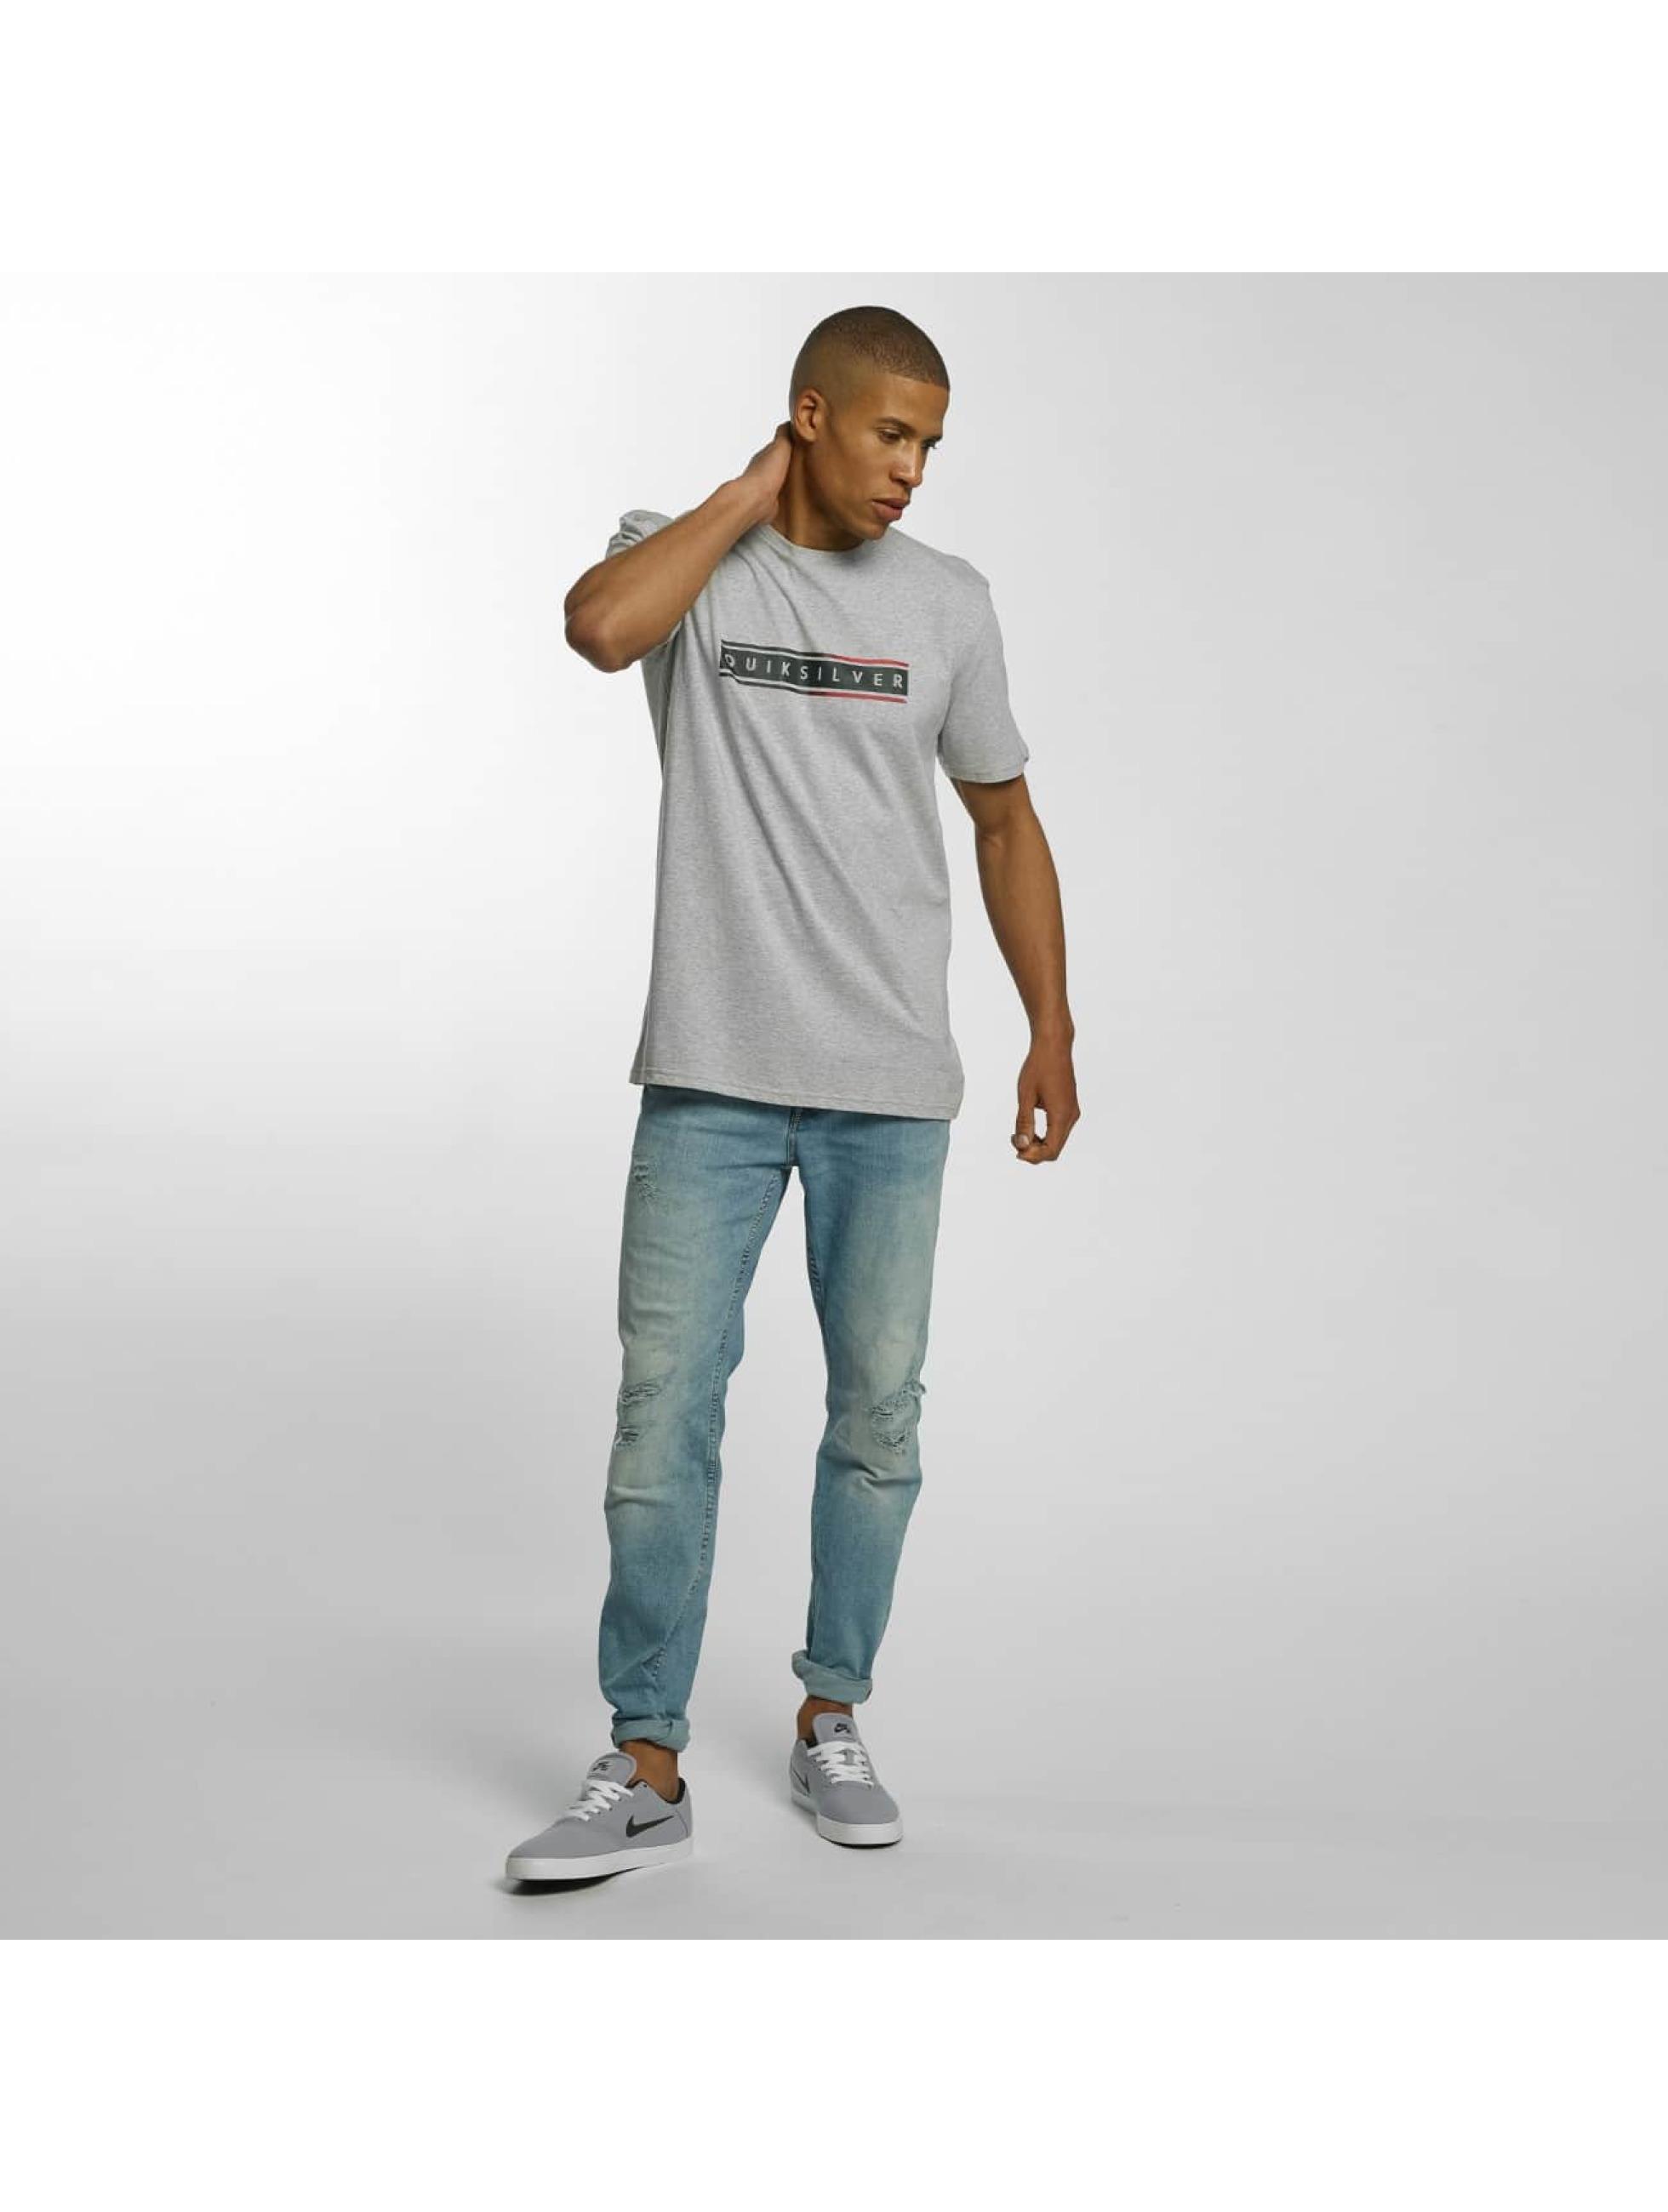 Quiksilver T-Shirt Classic Daily Surf gris